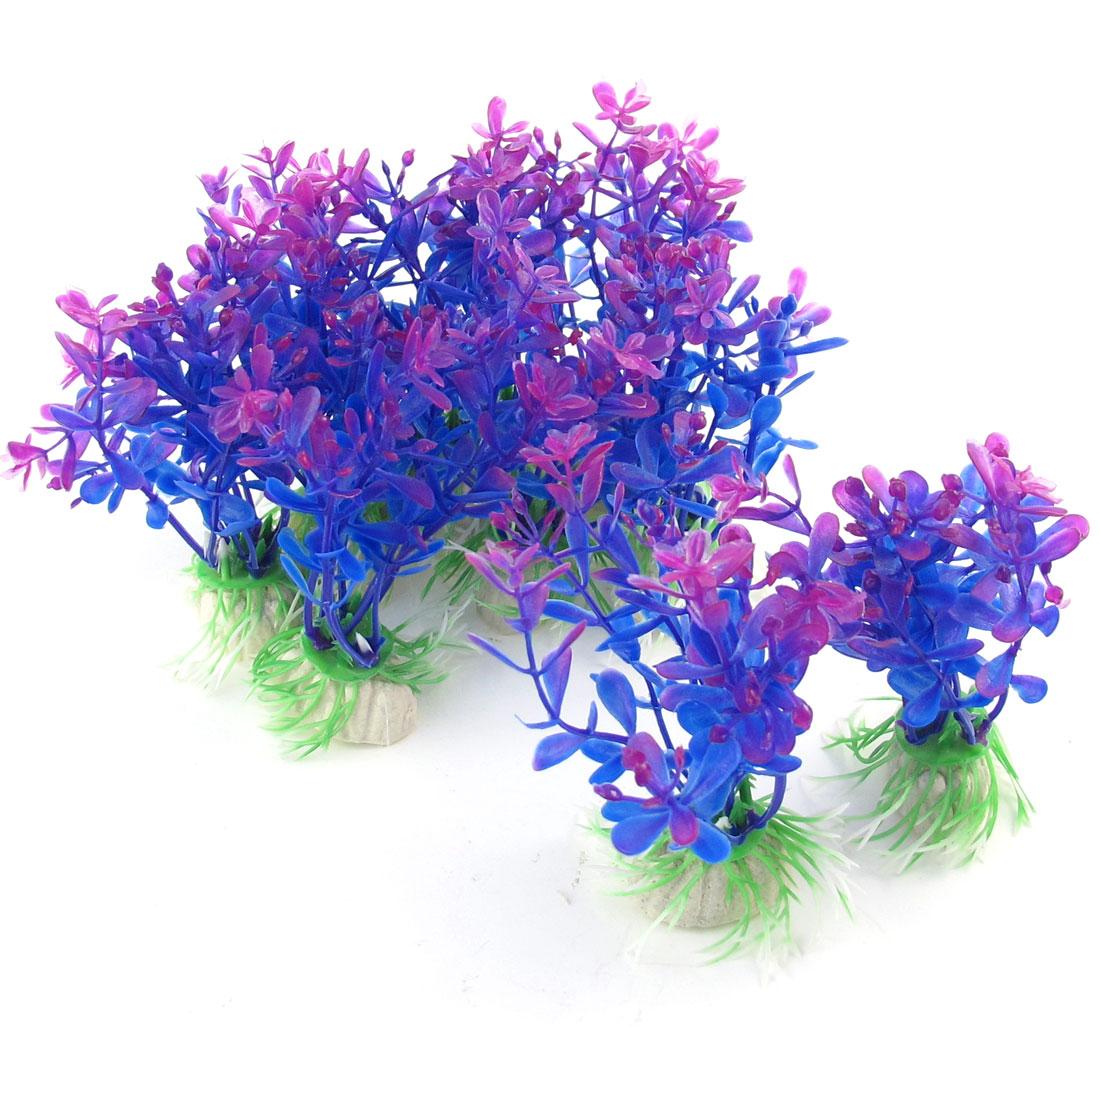 3-9-Height-Purple-Plastic-Water-Grass-Decor-Plants-10-Pcs-for-Fish-Tank